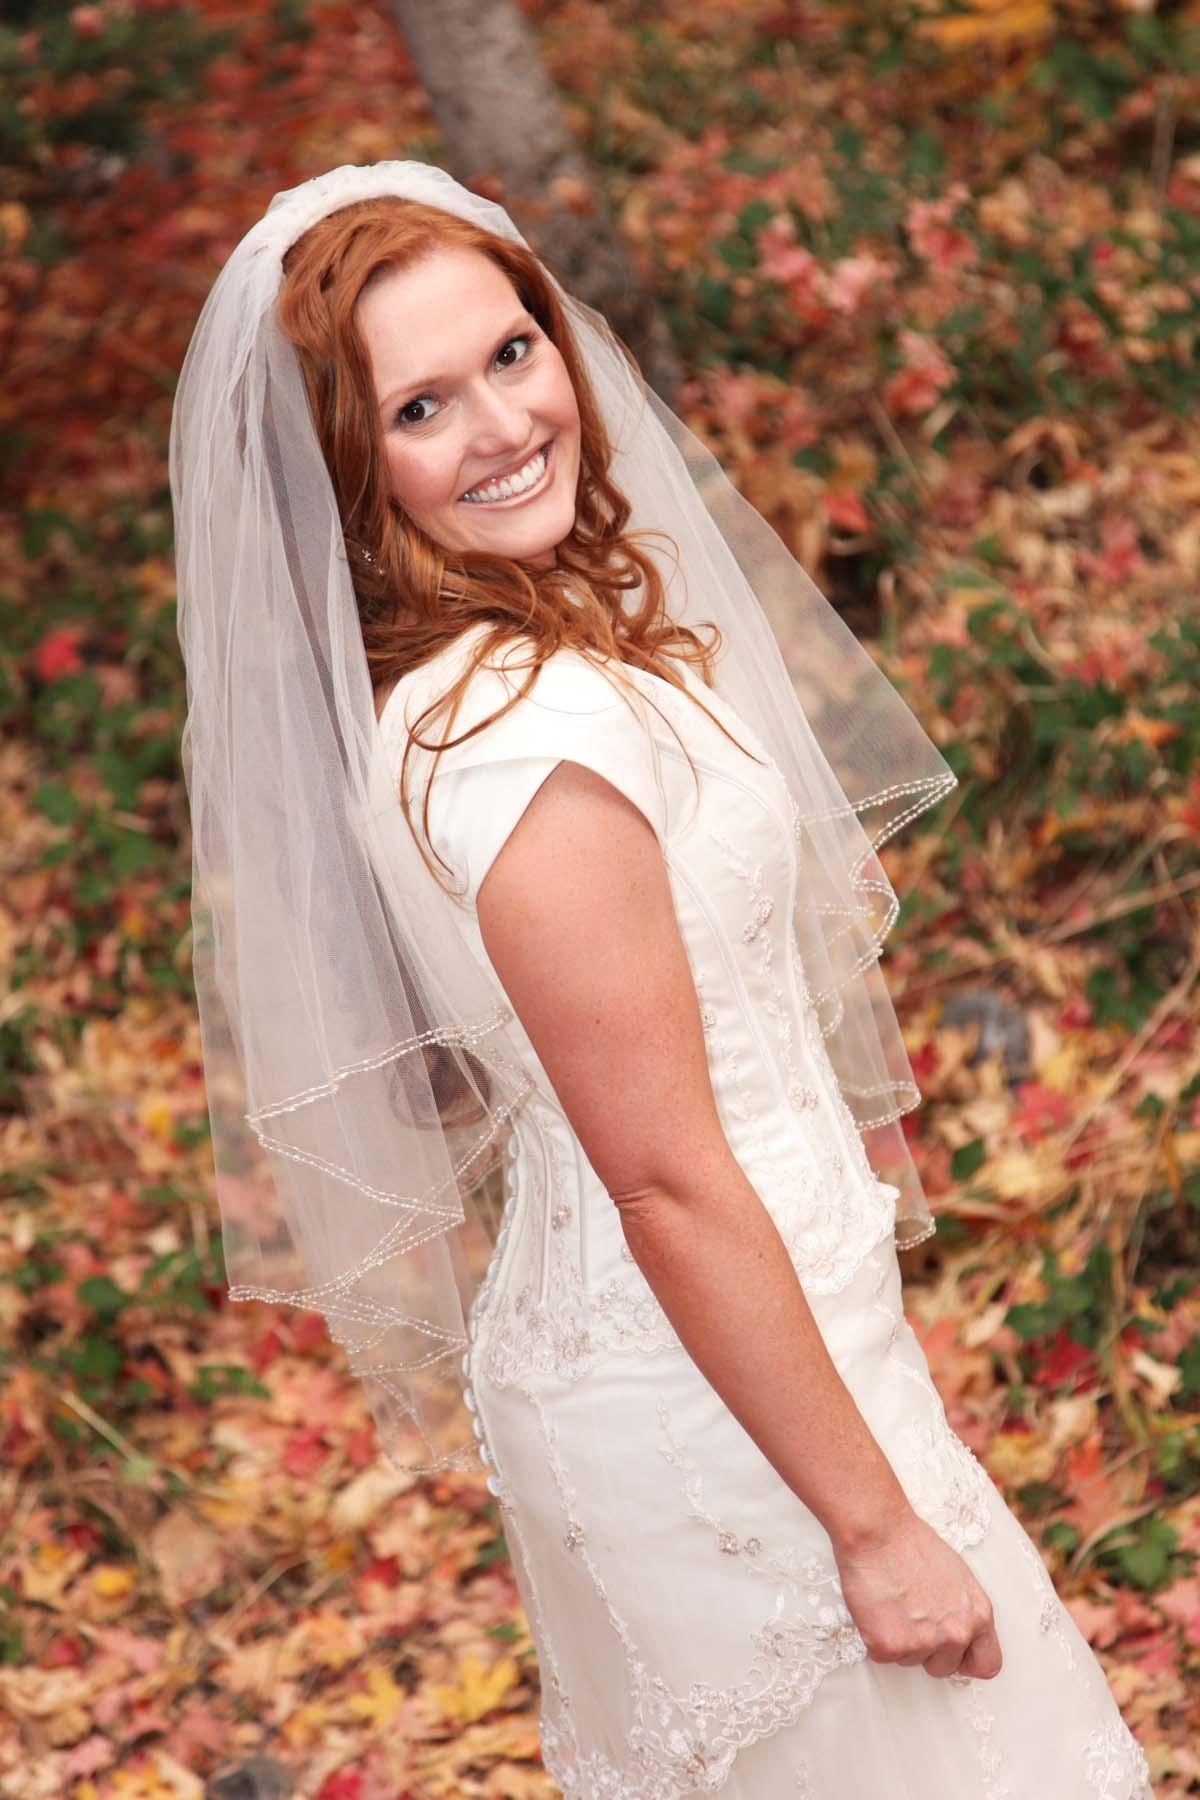 Sussex & Surrey Wedding Photographer - Bride & Groom (14)